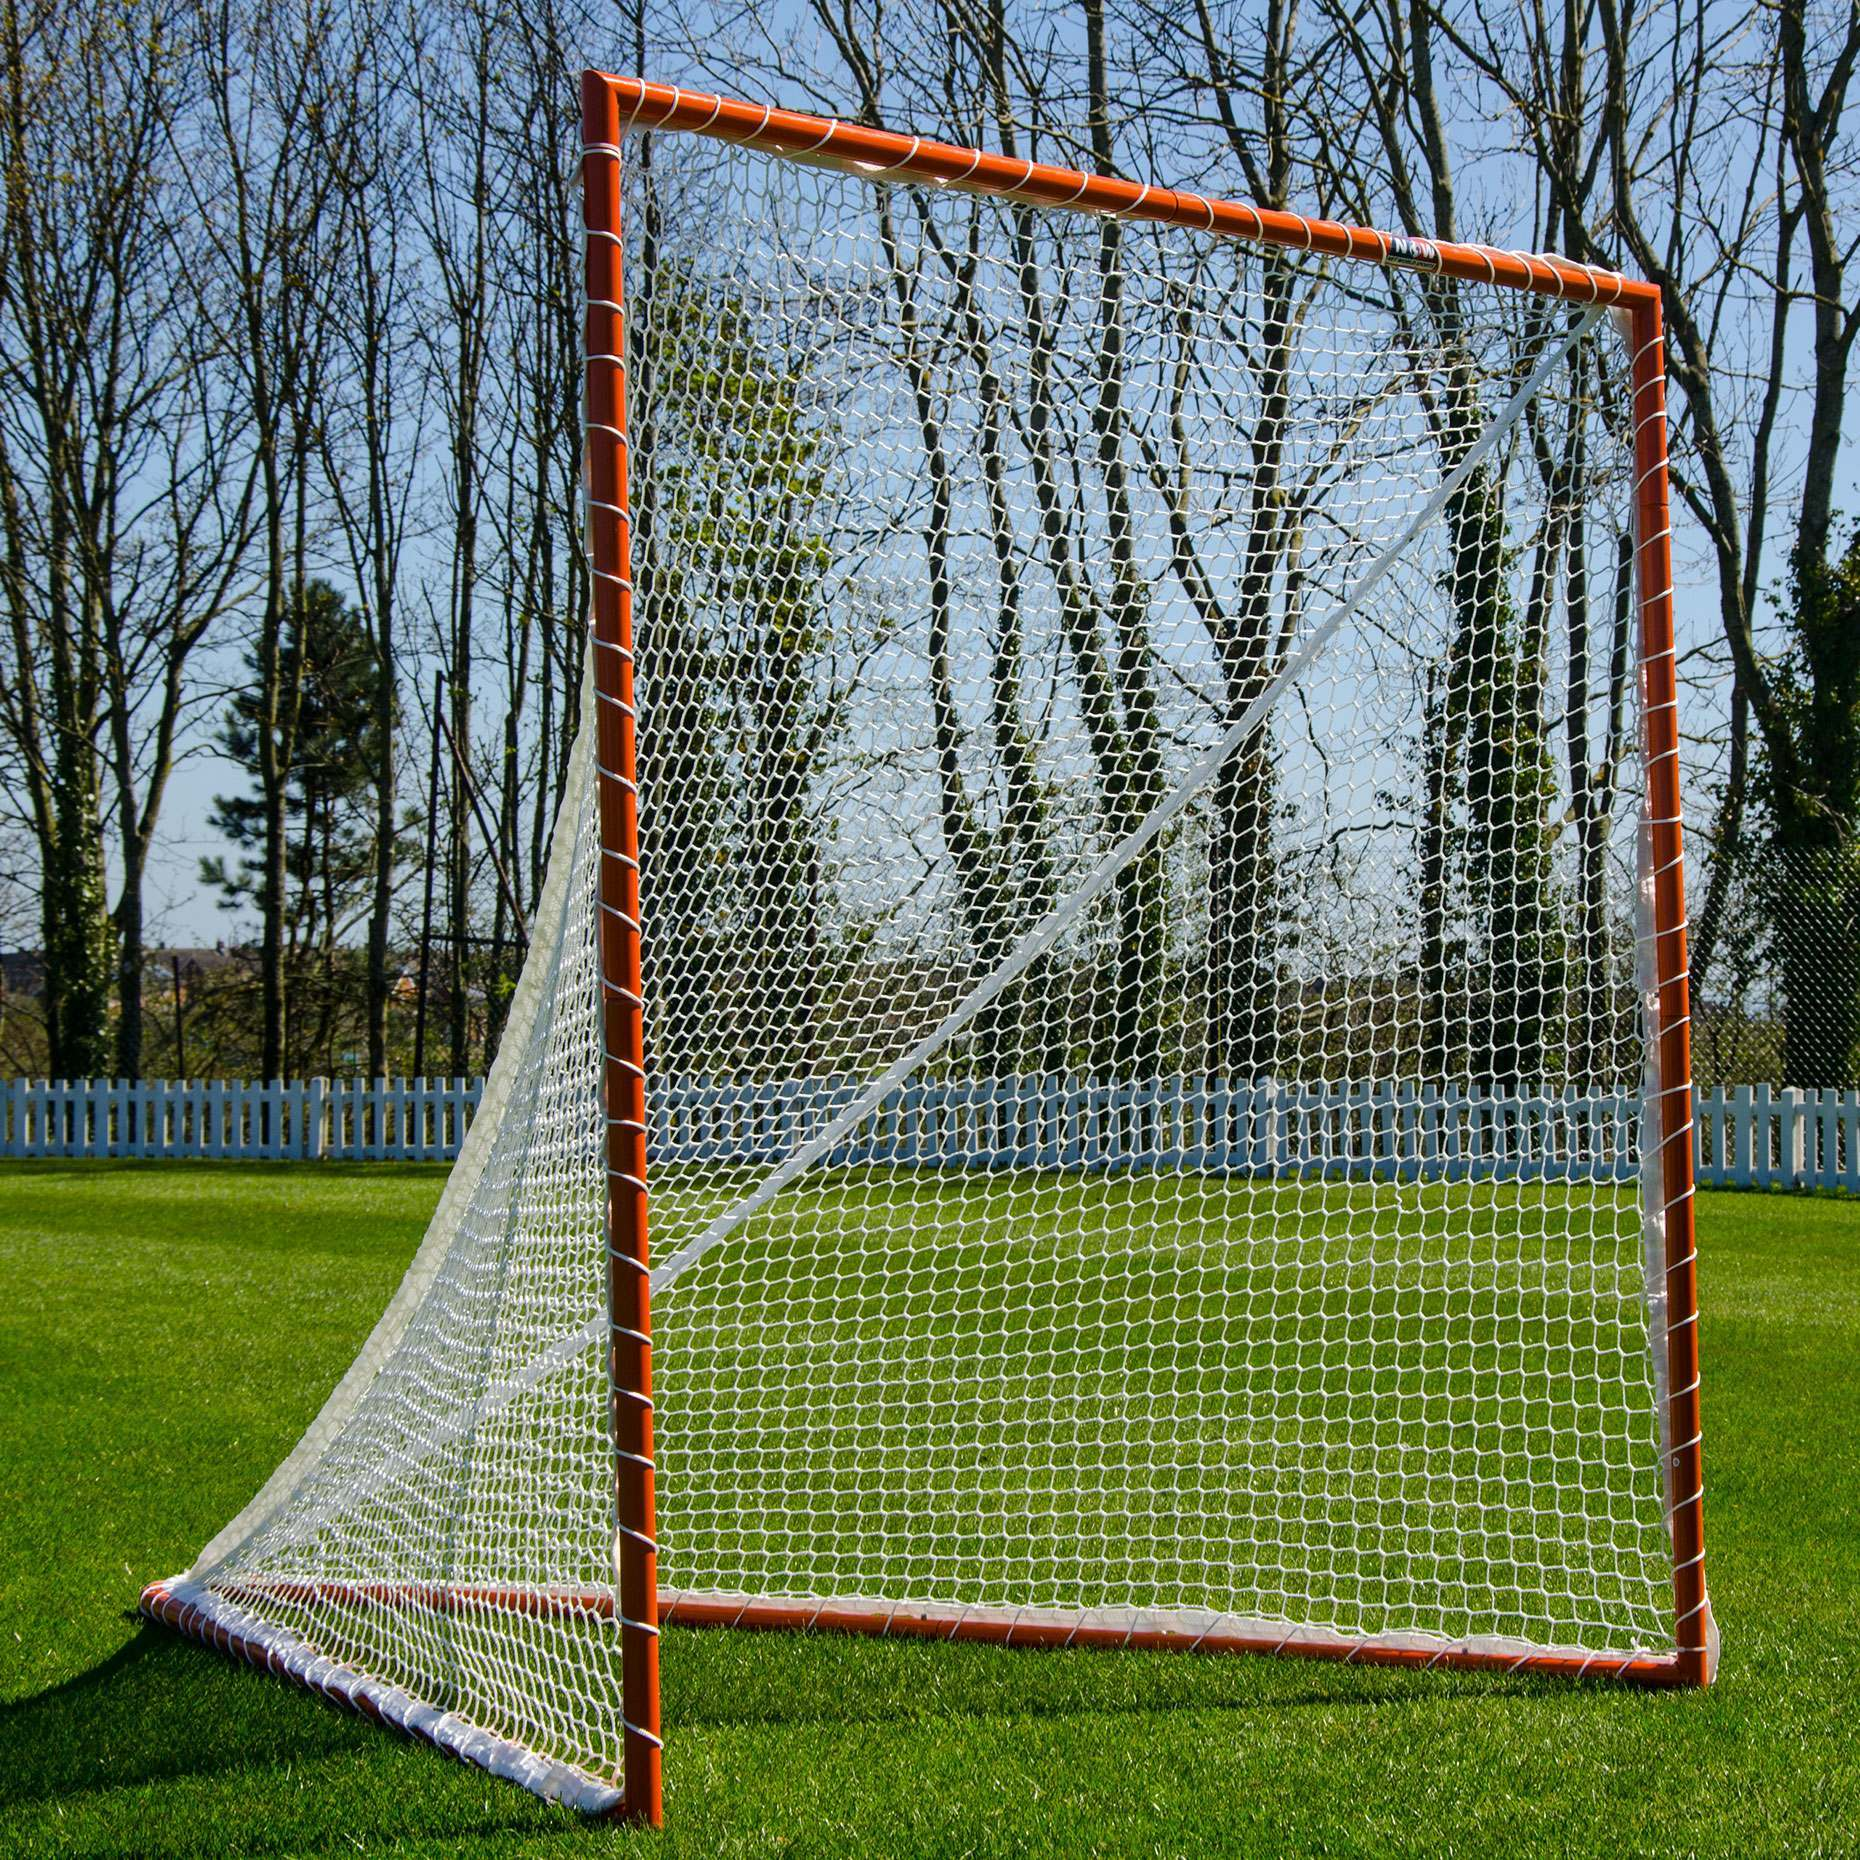 Regulation Lacrosse Goal 1.8m x 1.8m